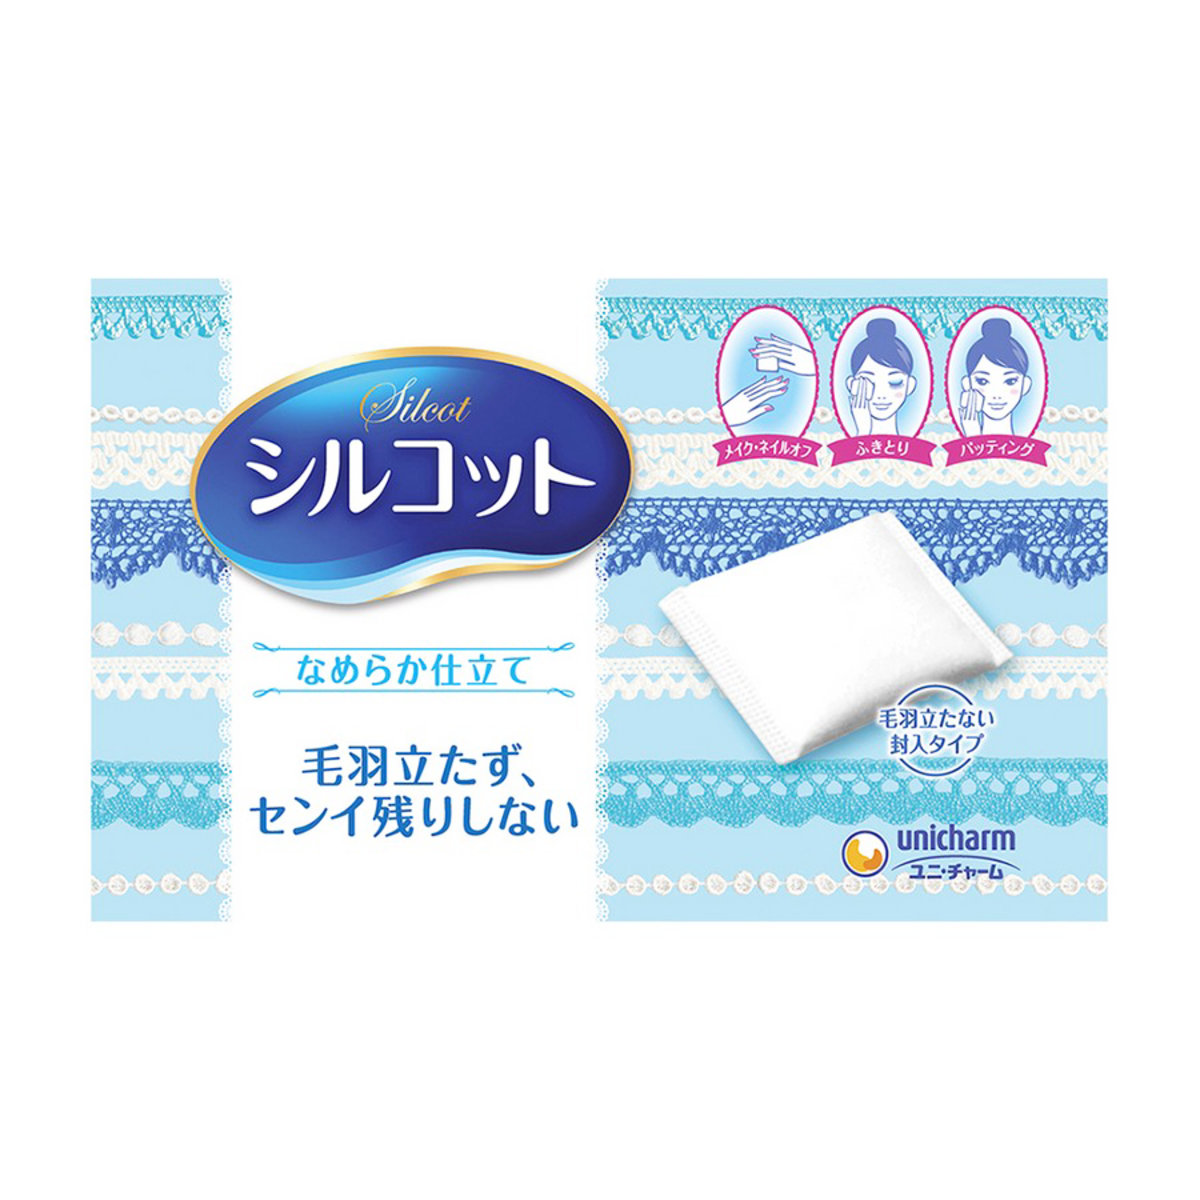 Silcot Velvety Touch Cotton 82Pcs Baby Blue Box